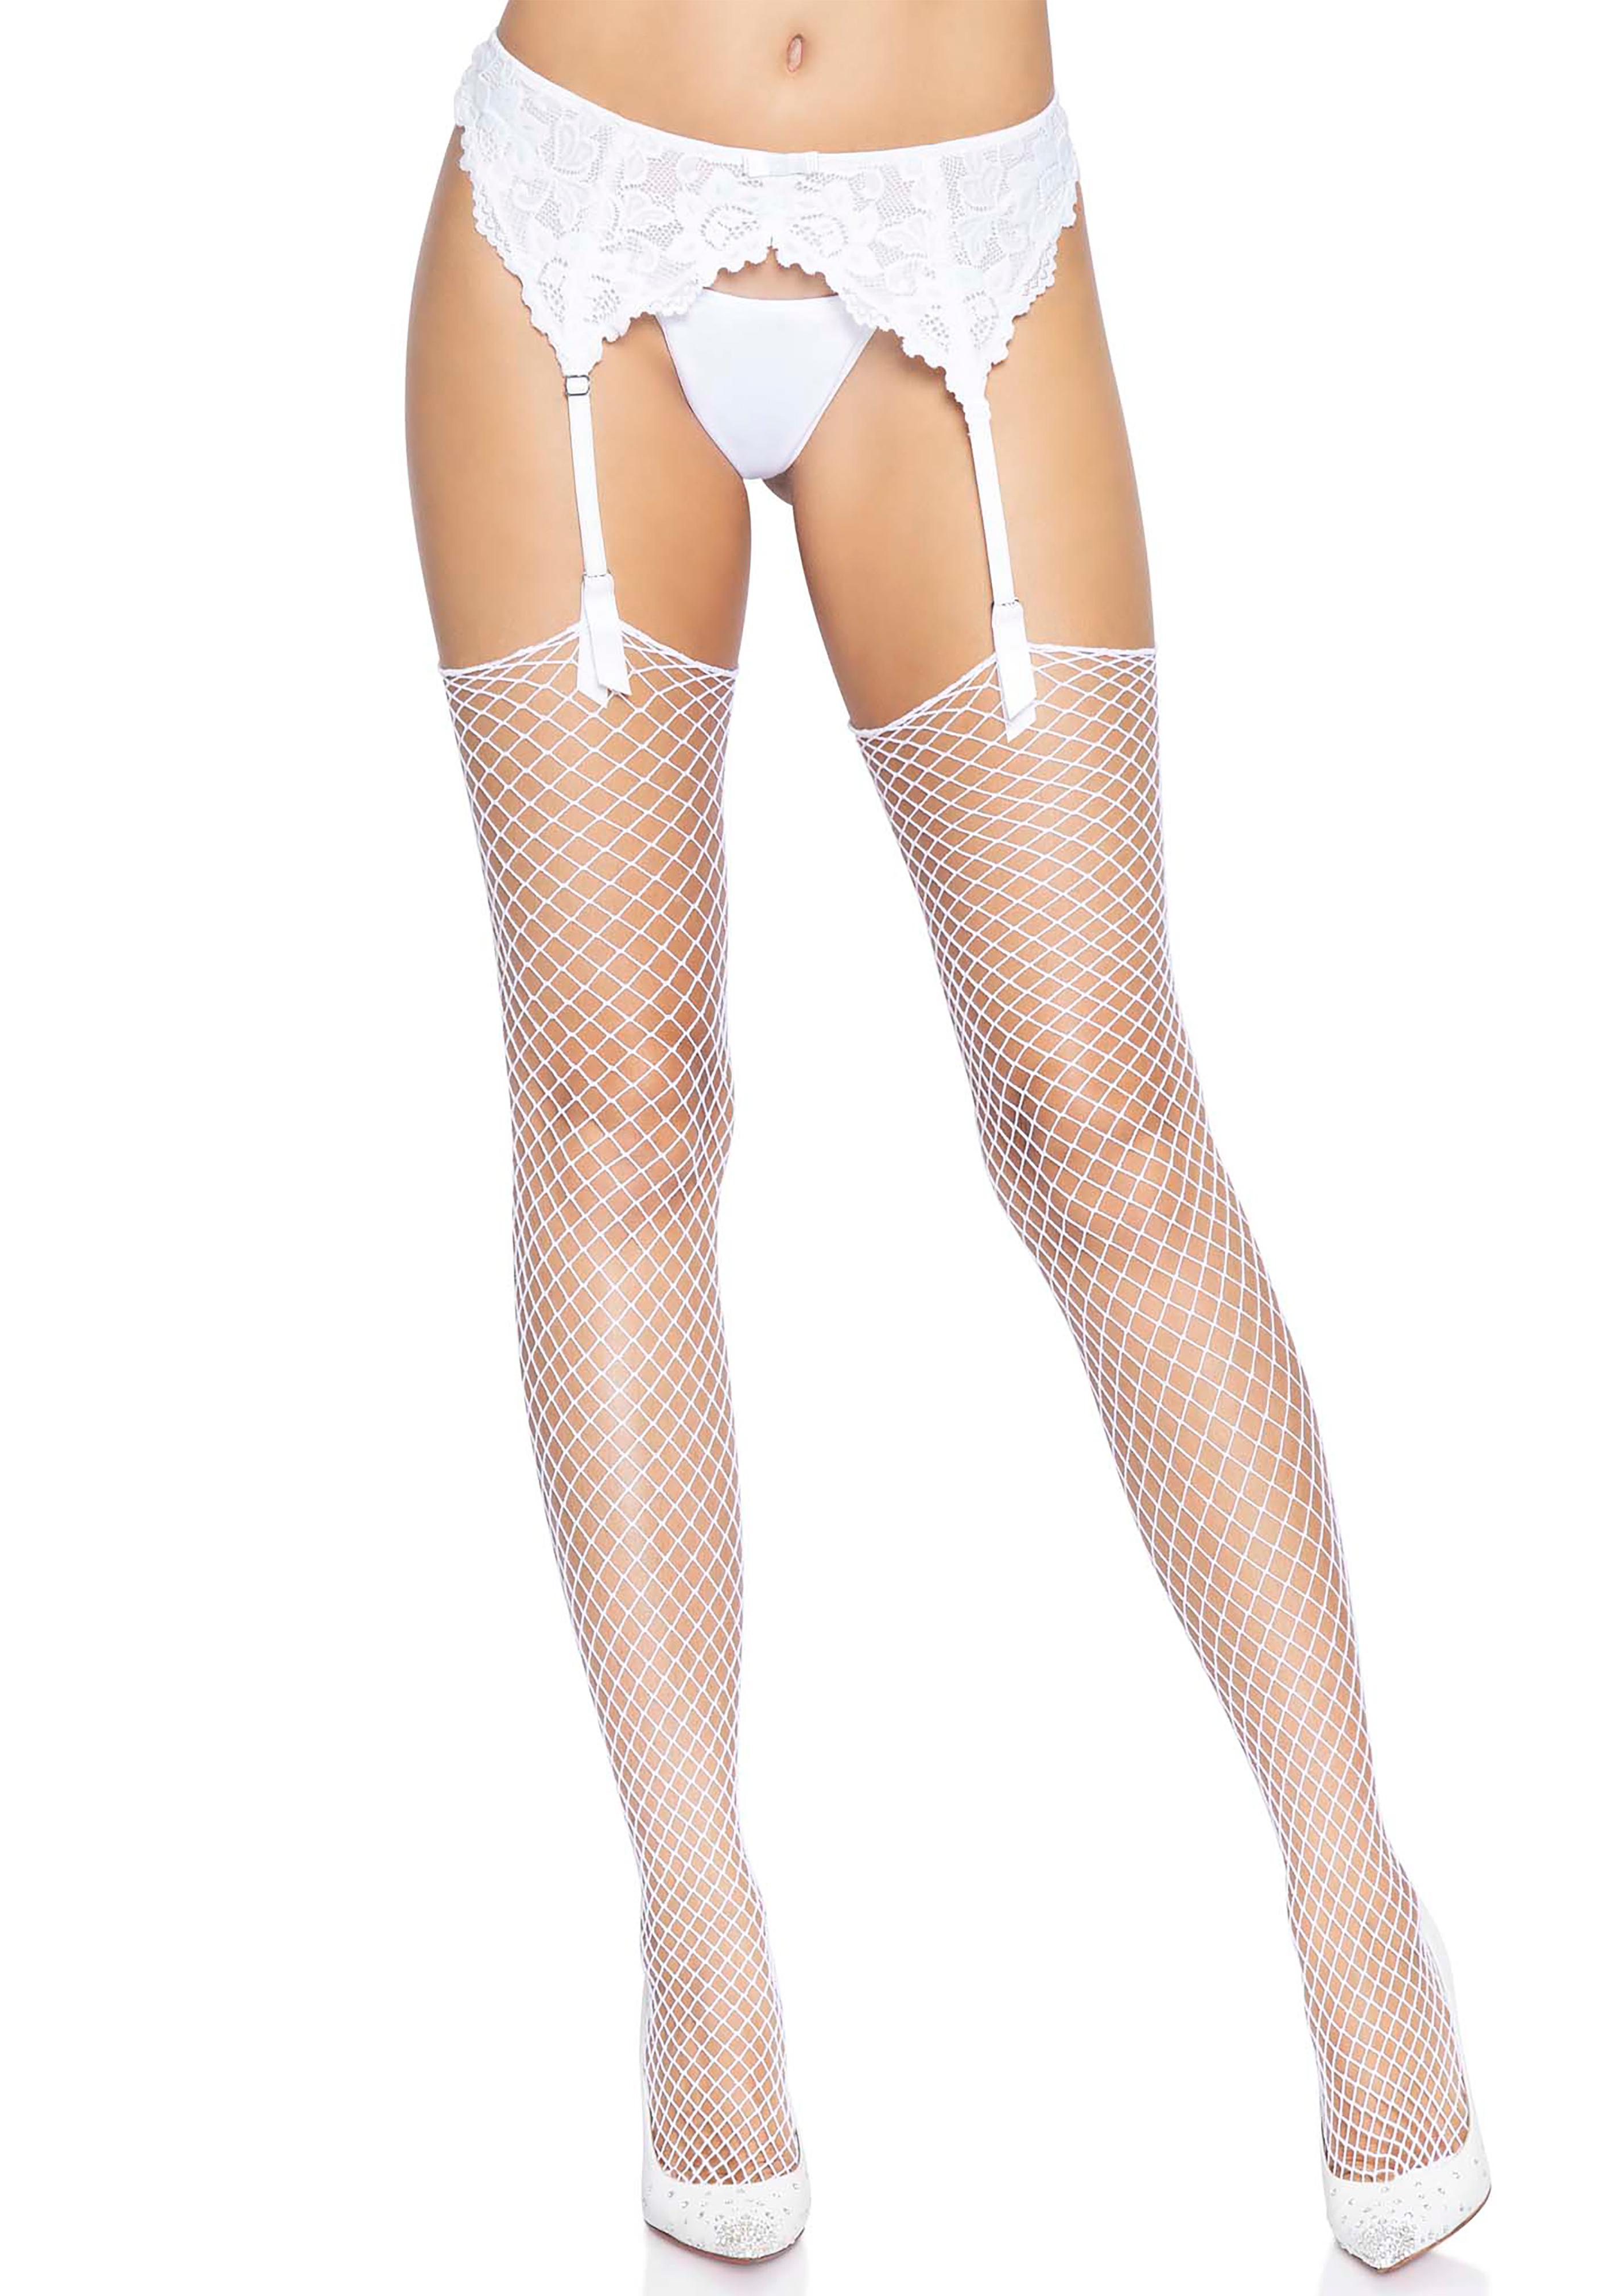 Industrial Net Stockings